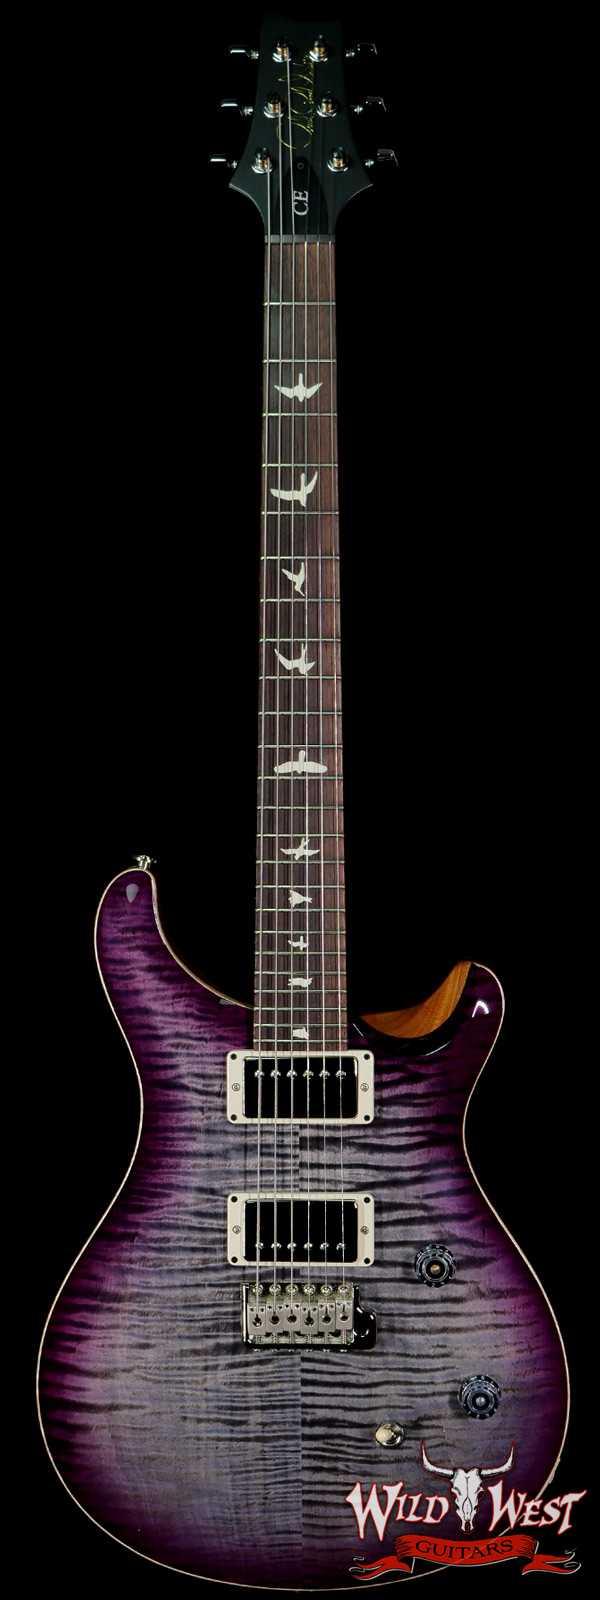 PRS Wild West Guitars Special Run Flame Top Black Neck CE 24 Faded Gray Black Purple Burst 318524